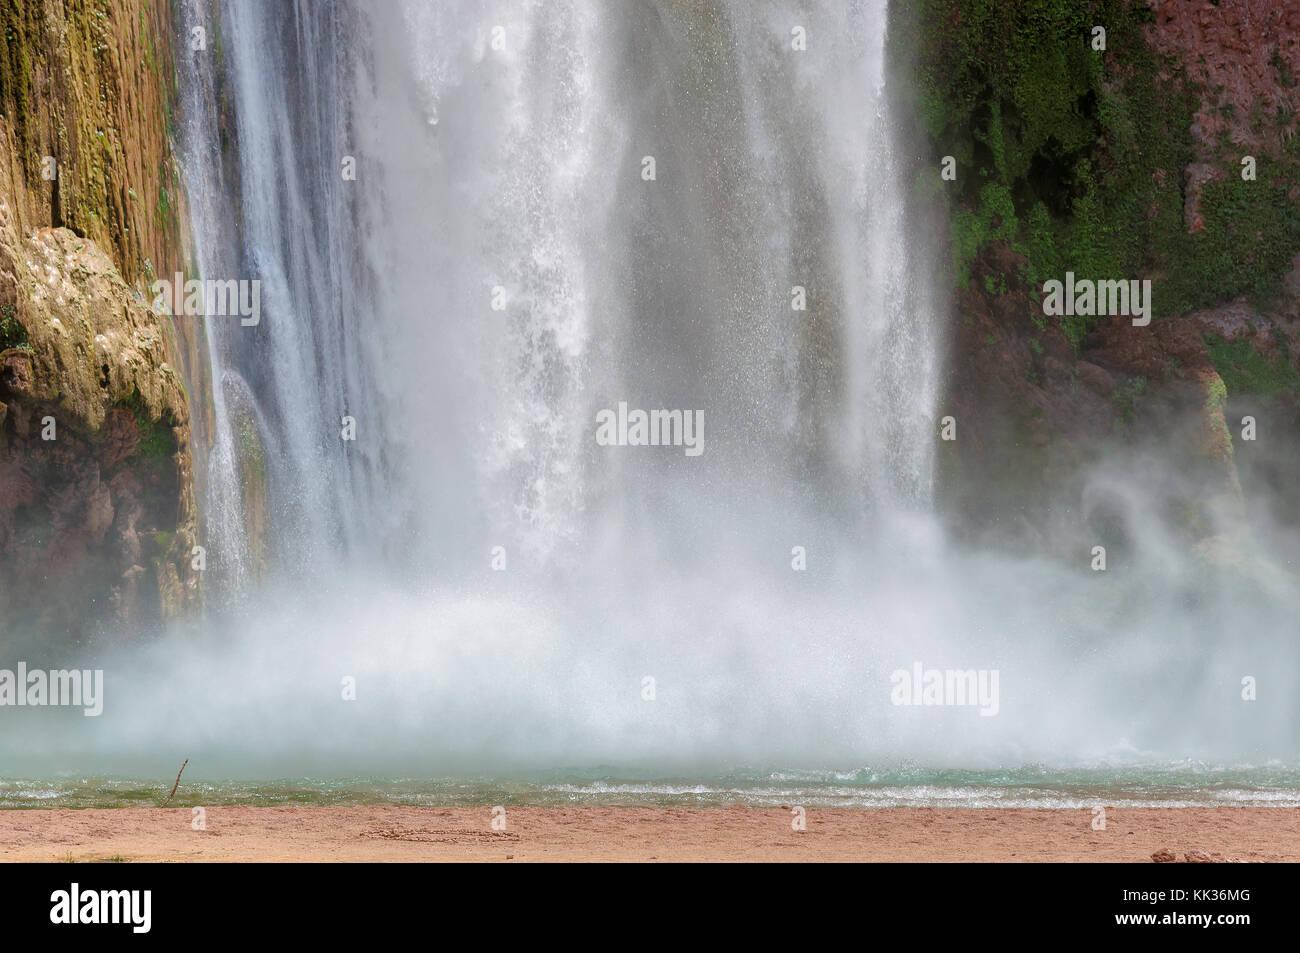 Waterfalls in the Grand Canyon, Arizona - Stock Image